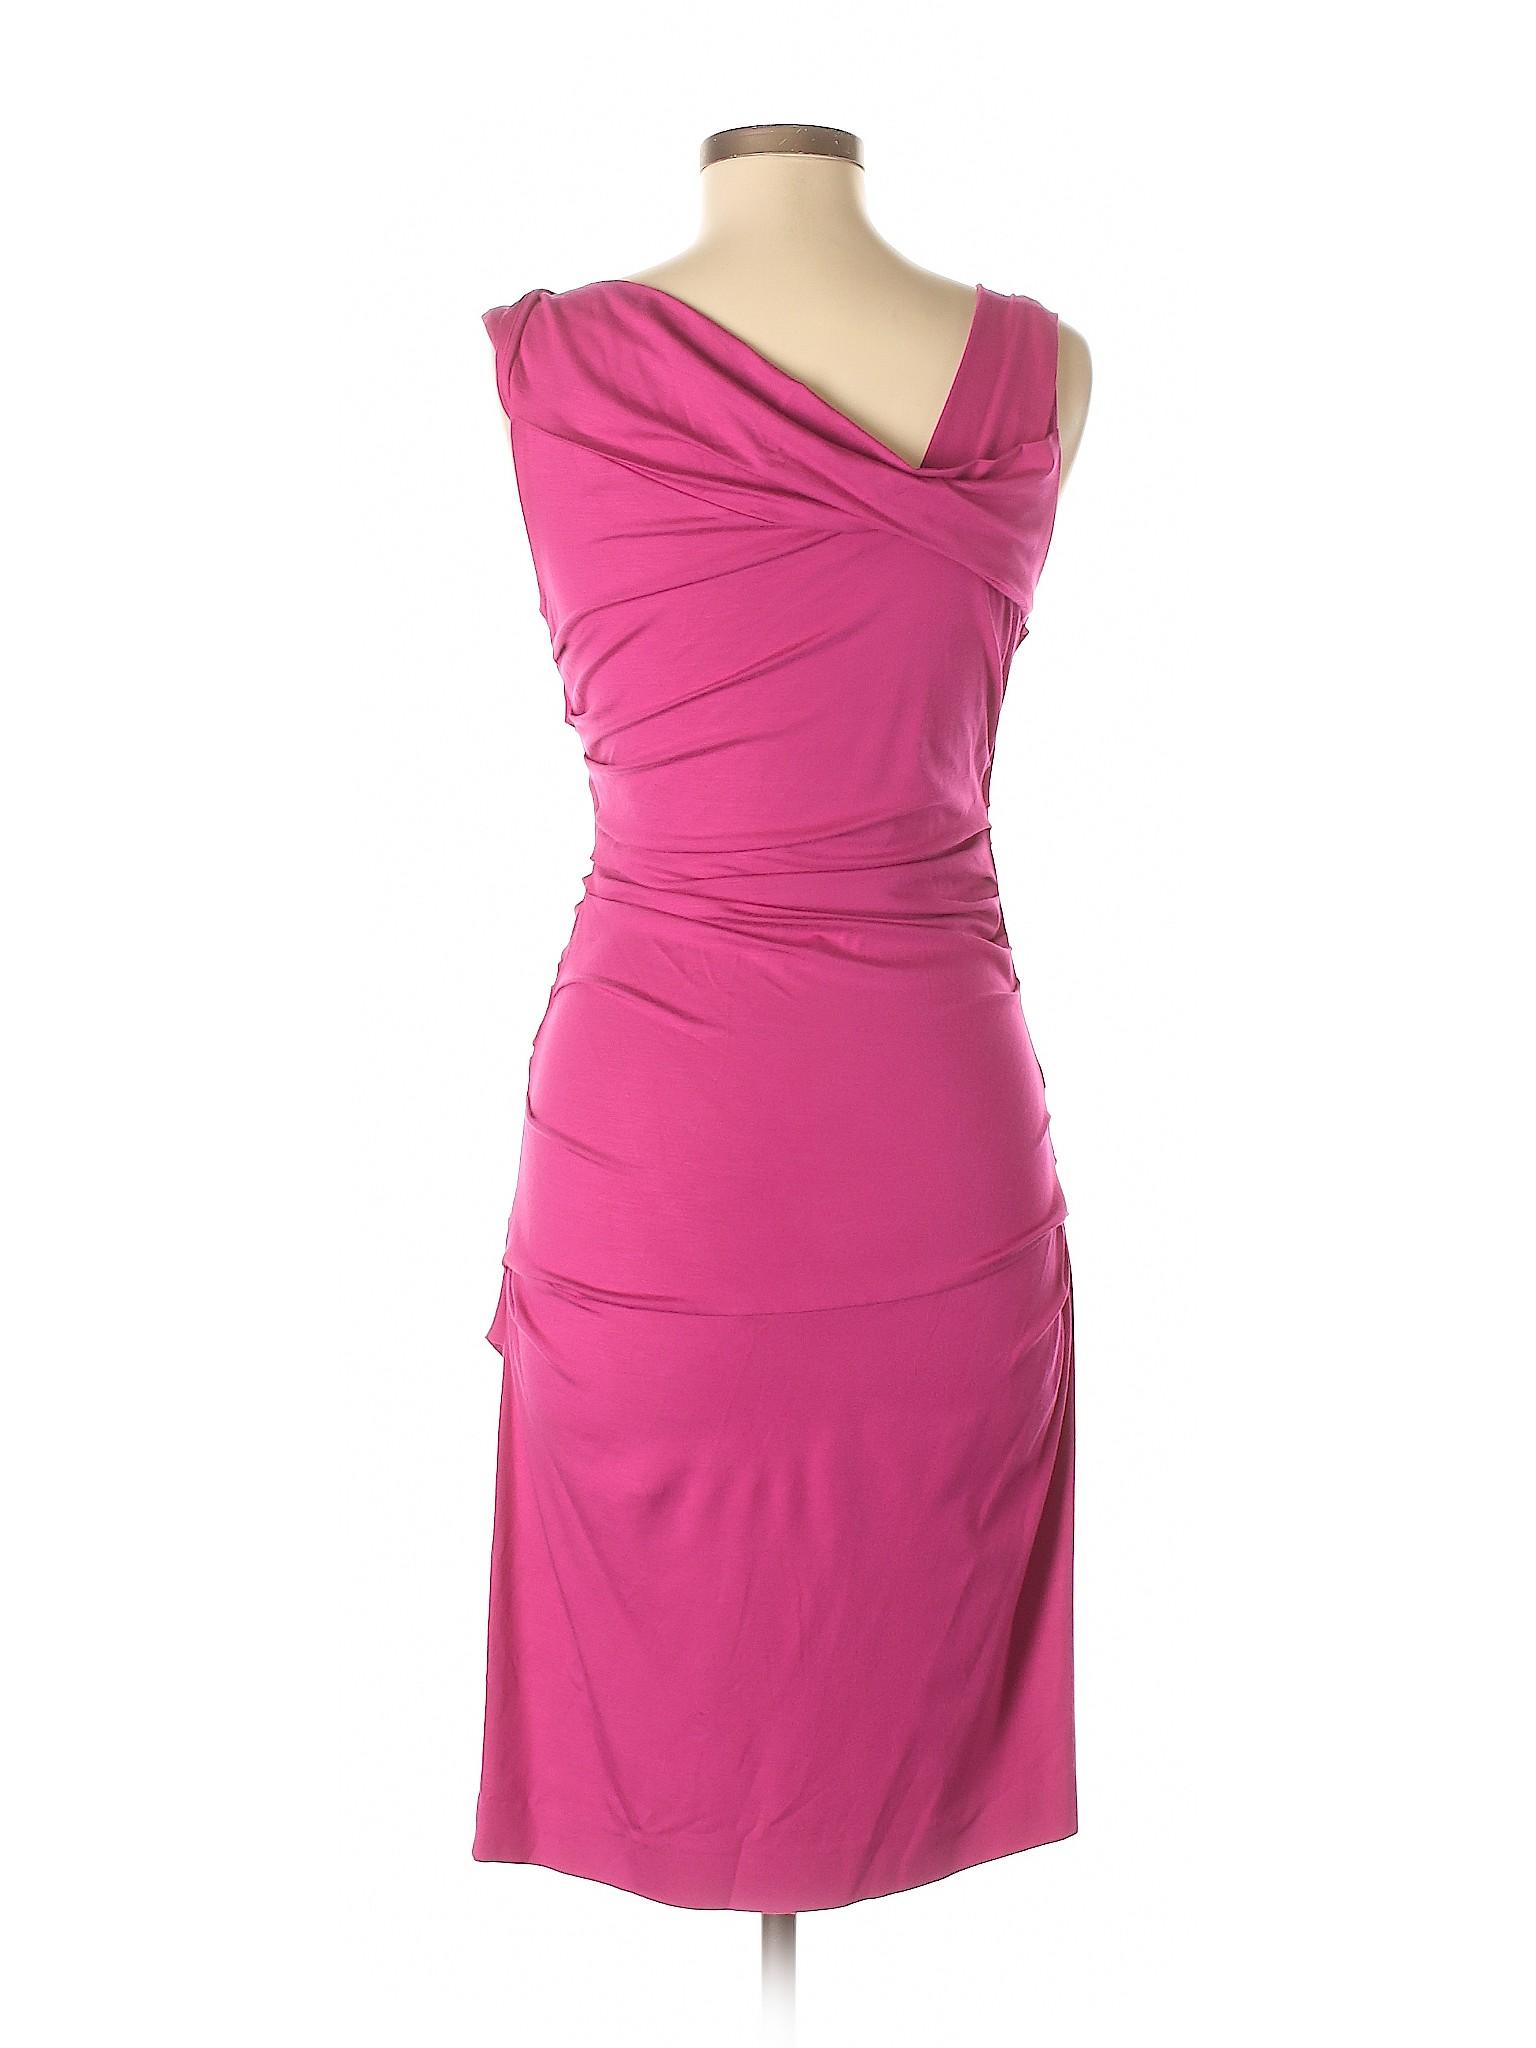 Selling Furstenberg Diane von Casual Dress rwTrAEzq